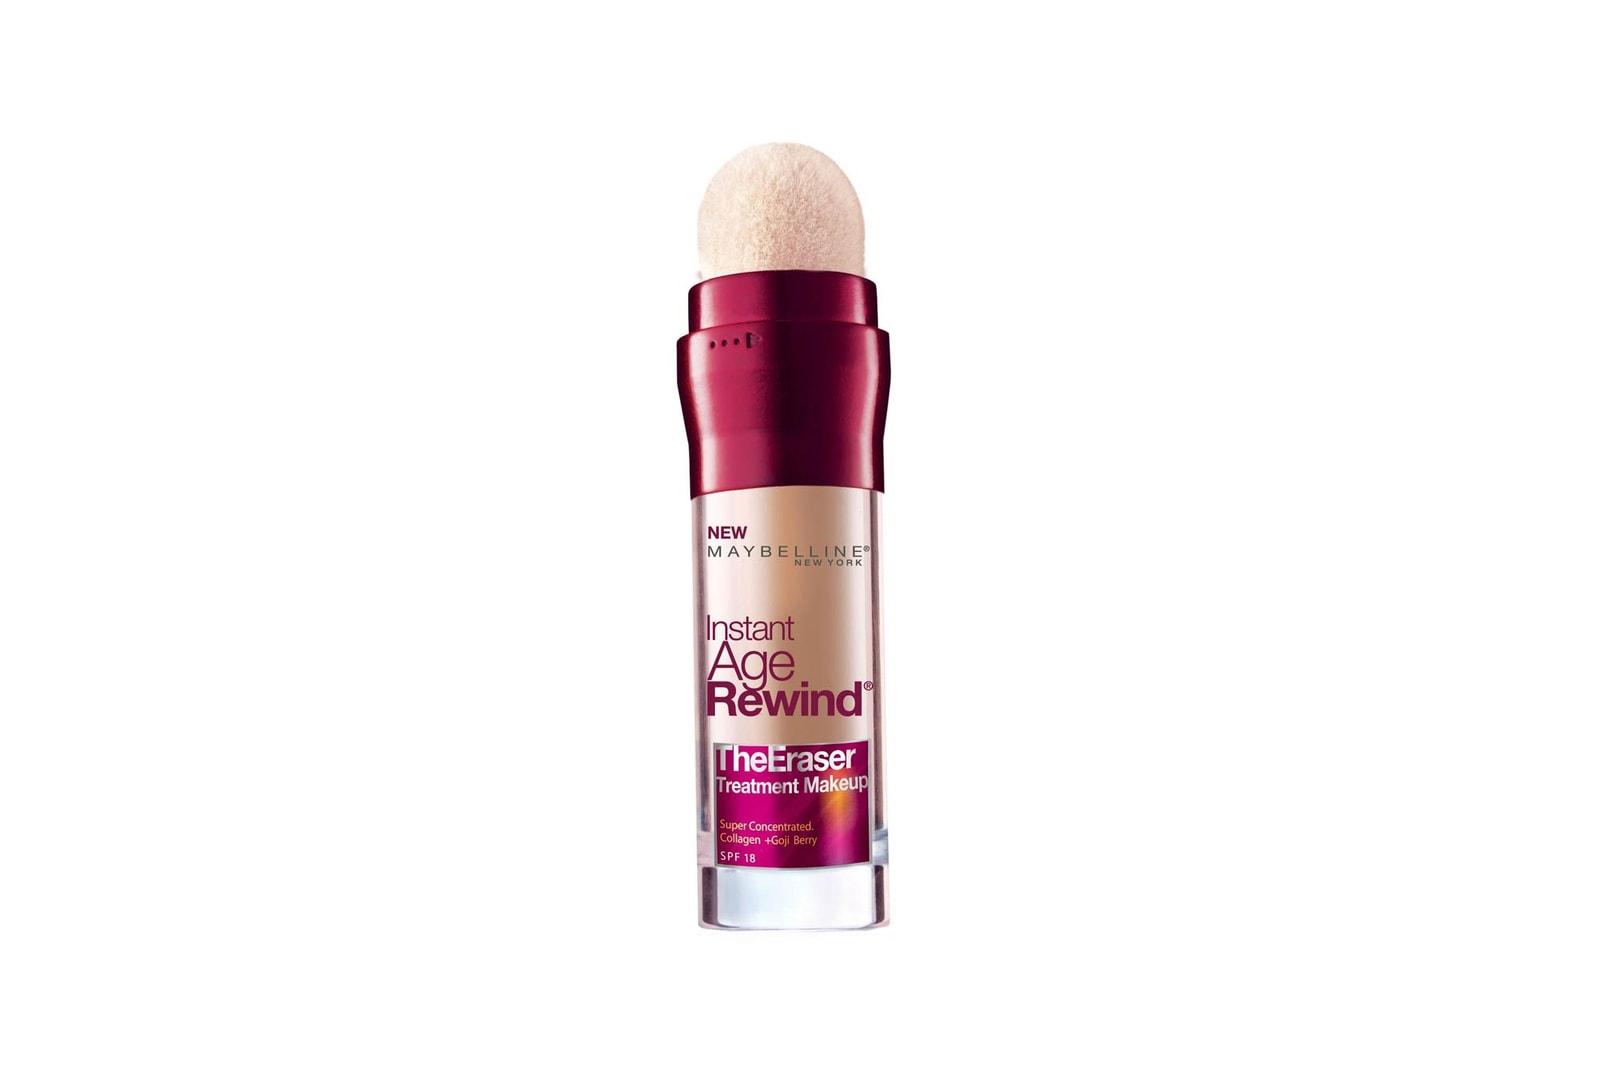 Best High End Makeup Products Luxury Affordable Budget Friendly 2017 Fenty Beauty Rihanna Highlighter KKW Kim Kardashian Contour Urban Decay ColourPop Ordinary Glossier